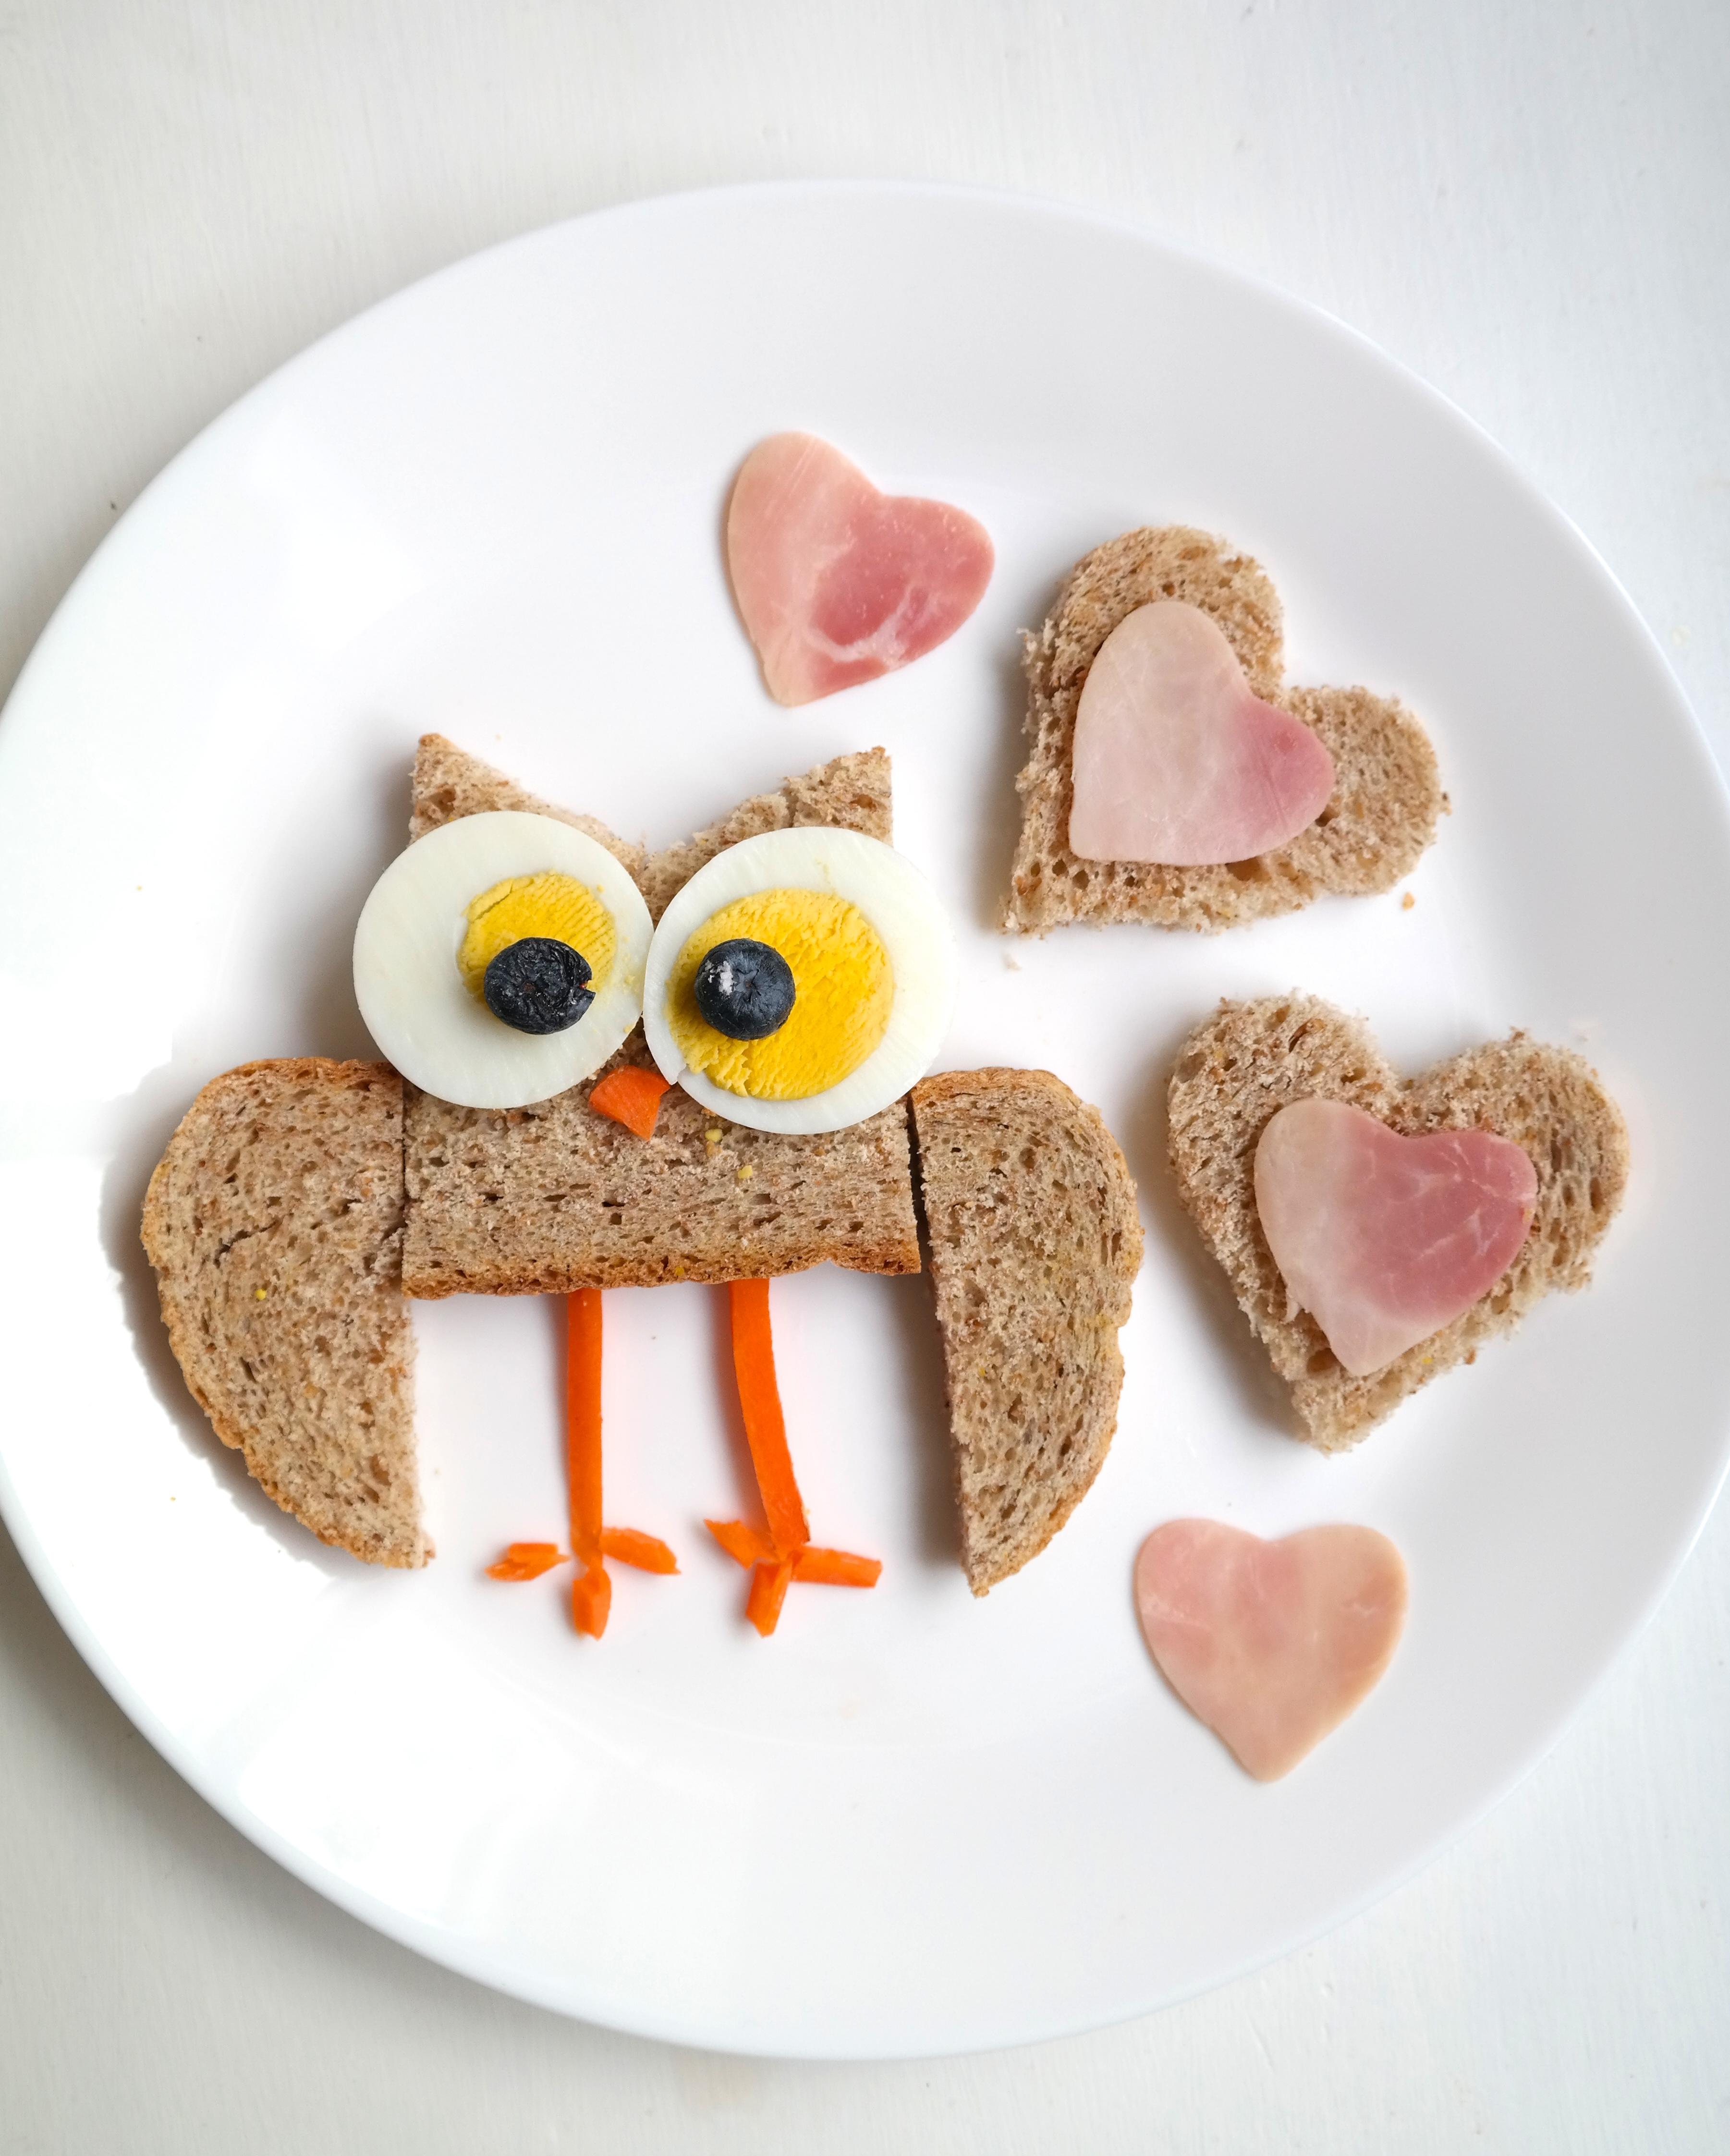 Ugle-skive til frokost